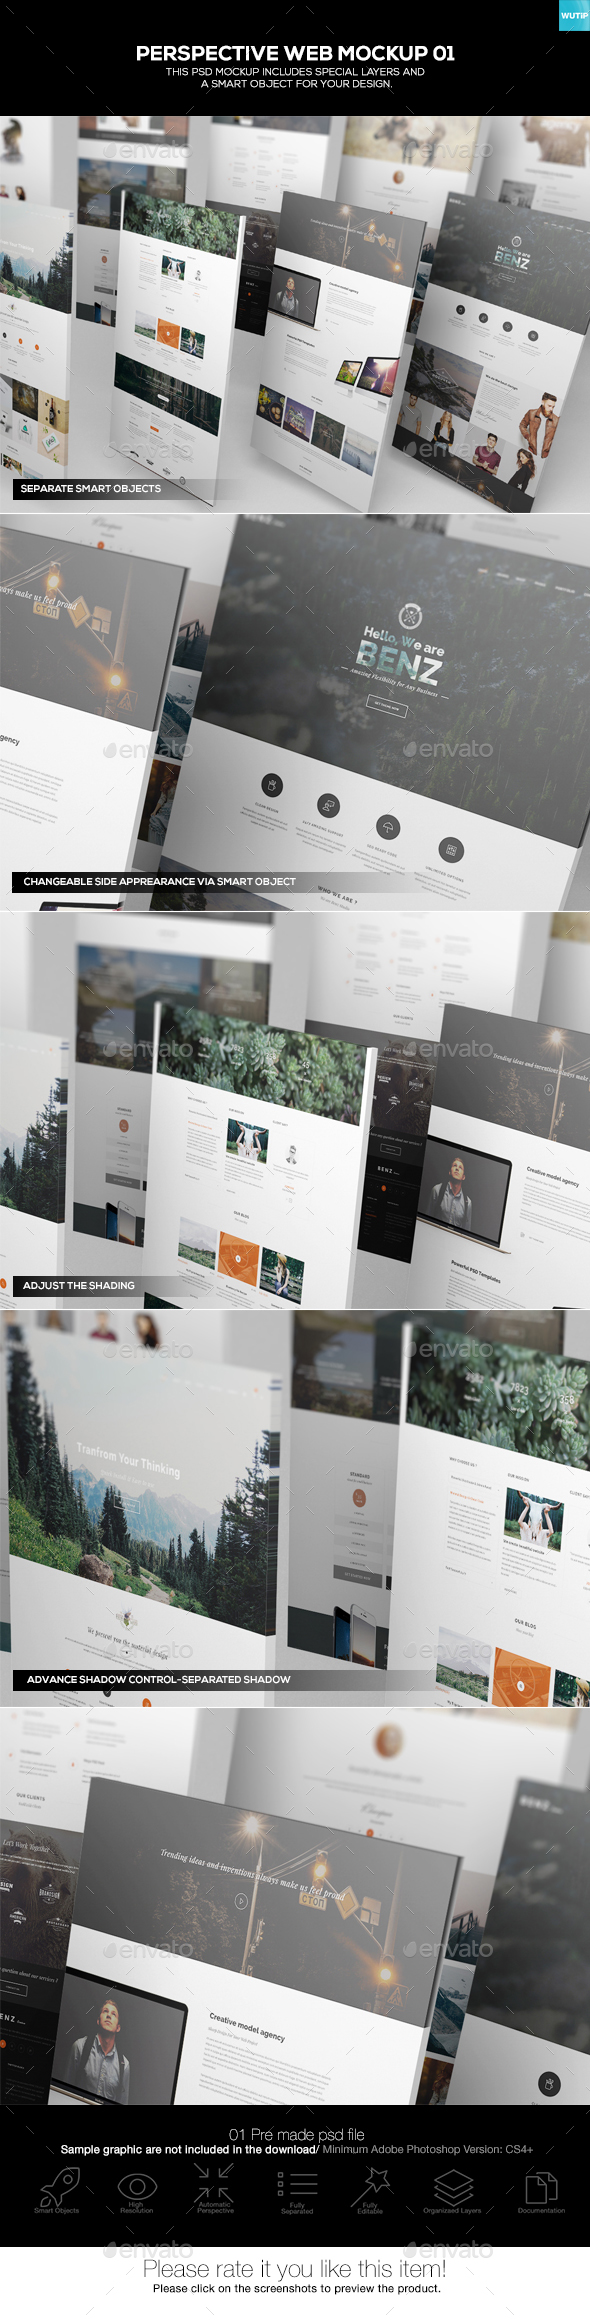 Perspective Web Mockup 01 - Website Displays